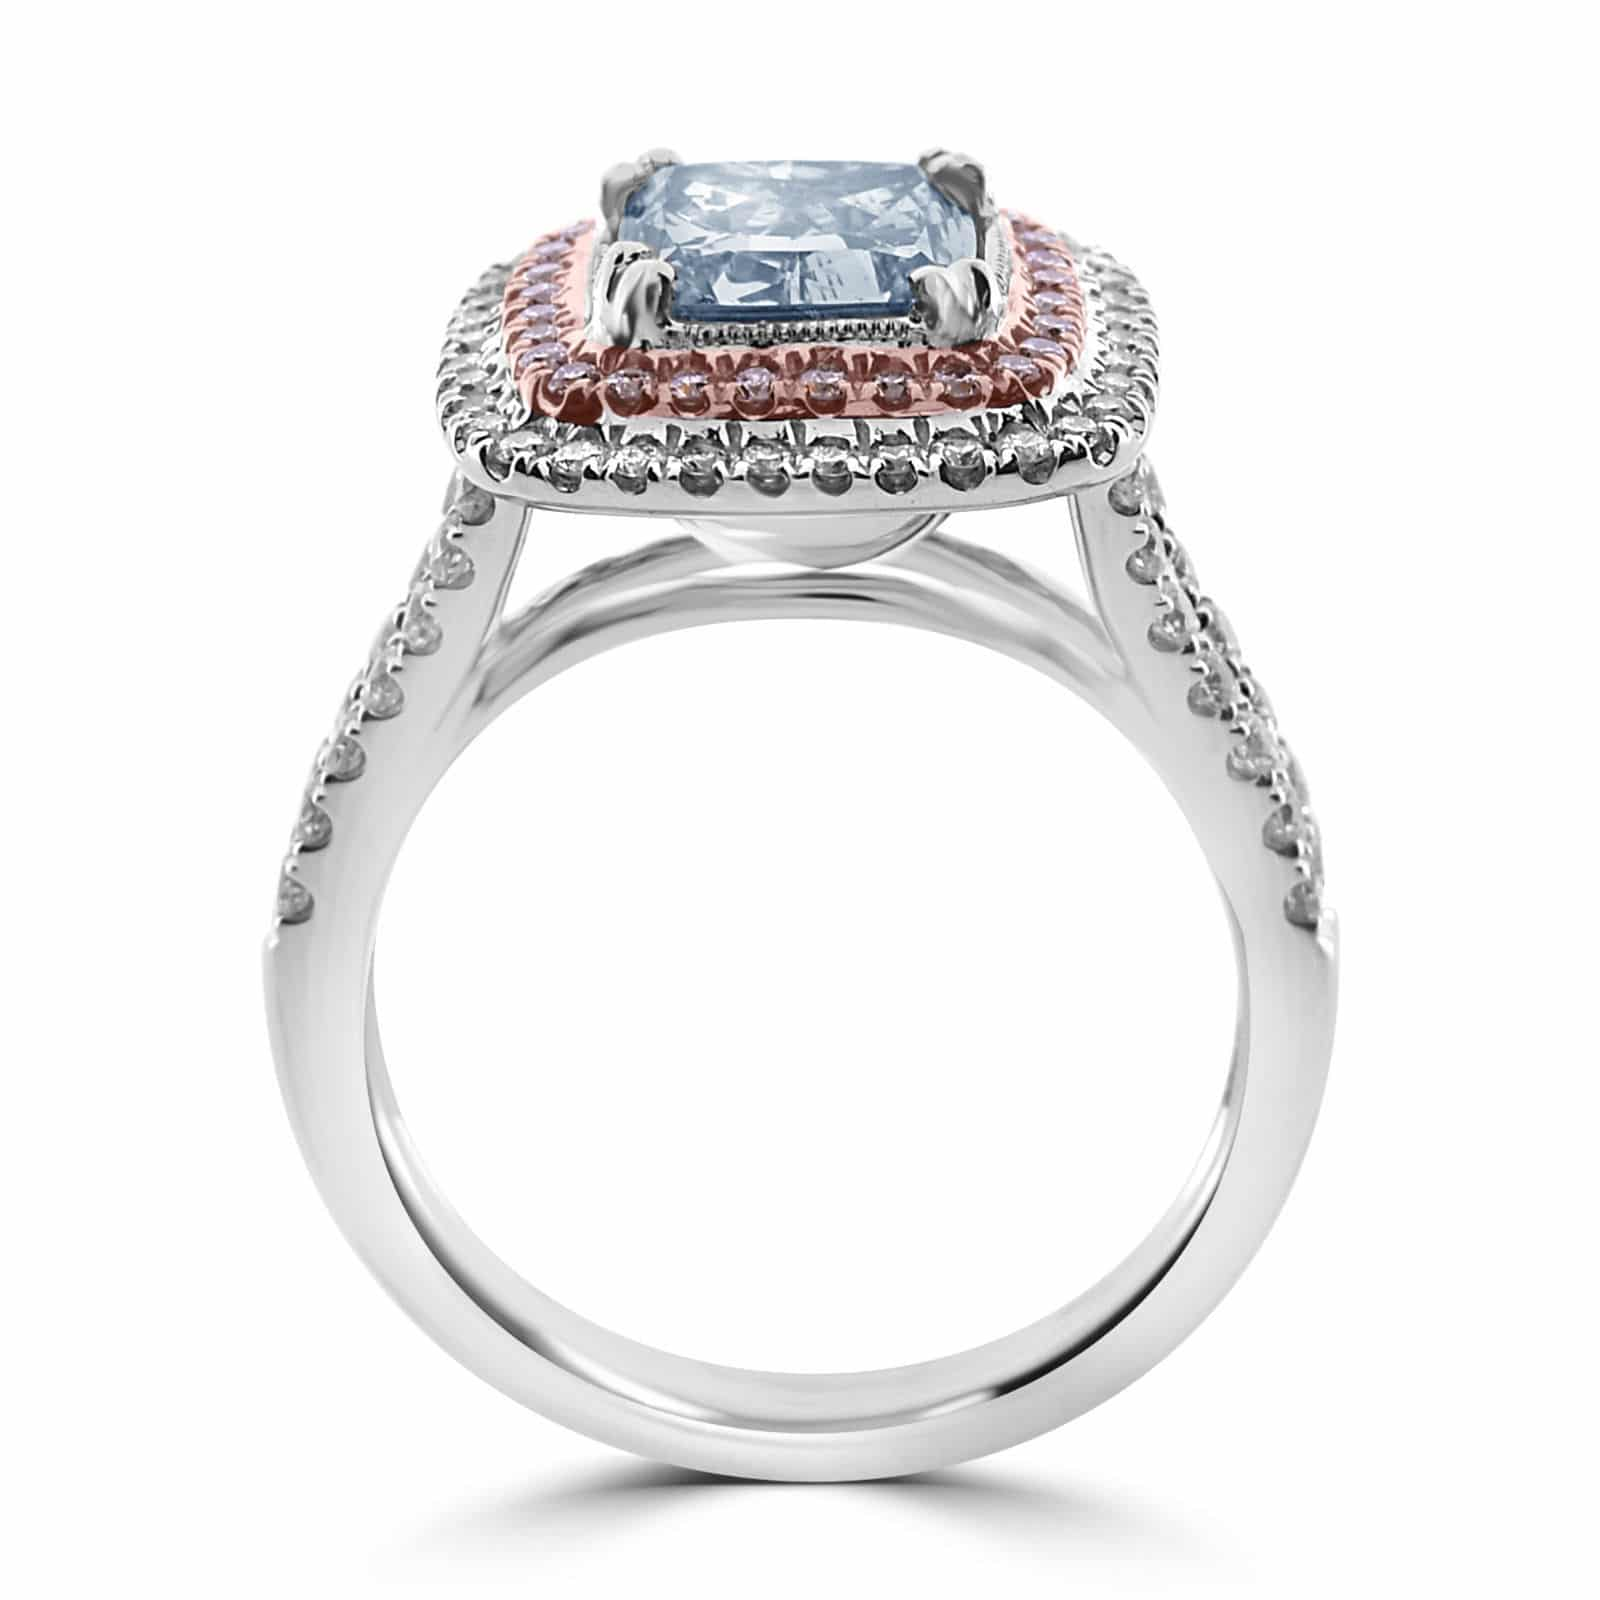 GIA 2.75ct Natural Fancy Light Blue Pink Diamonds Engagement Ring 18K